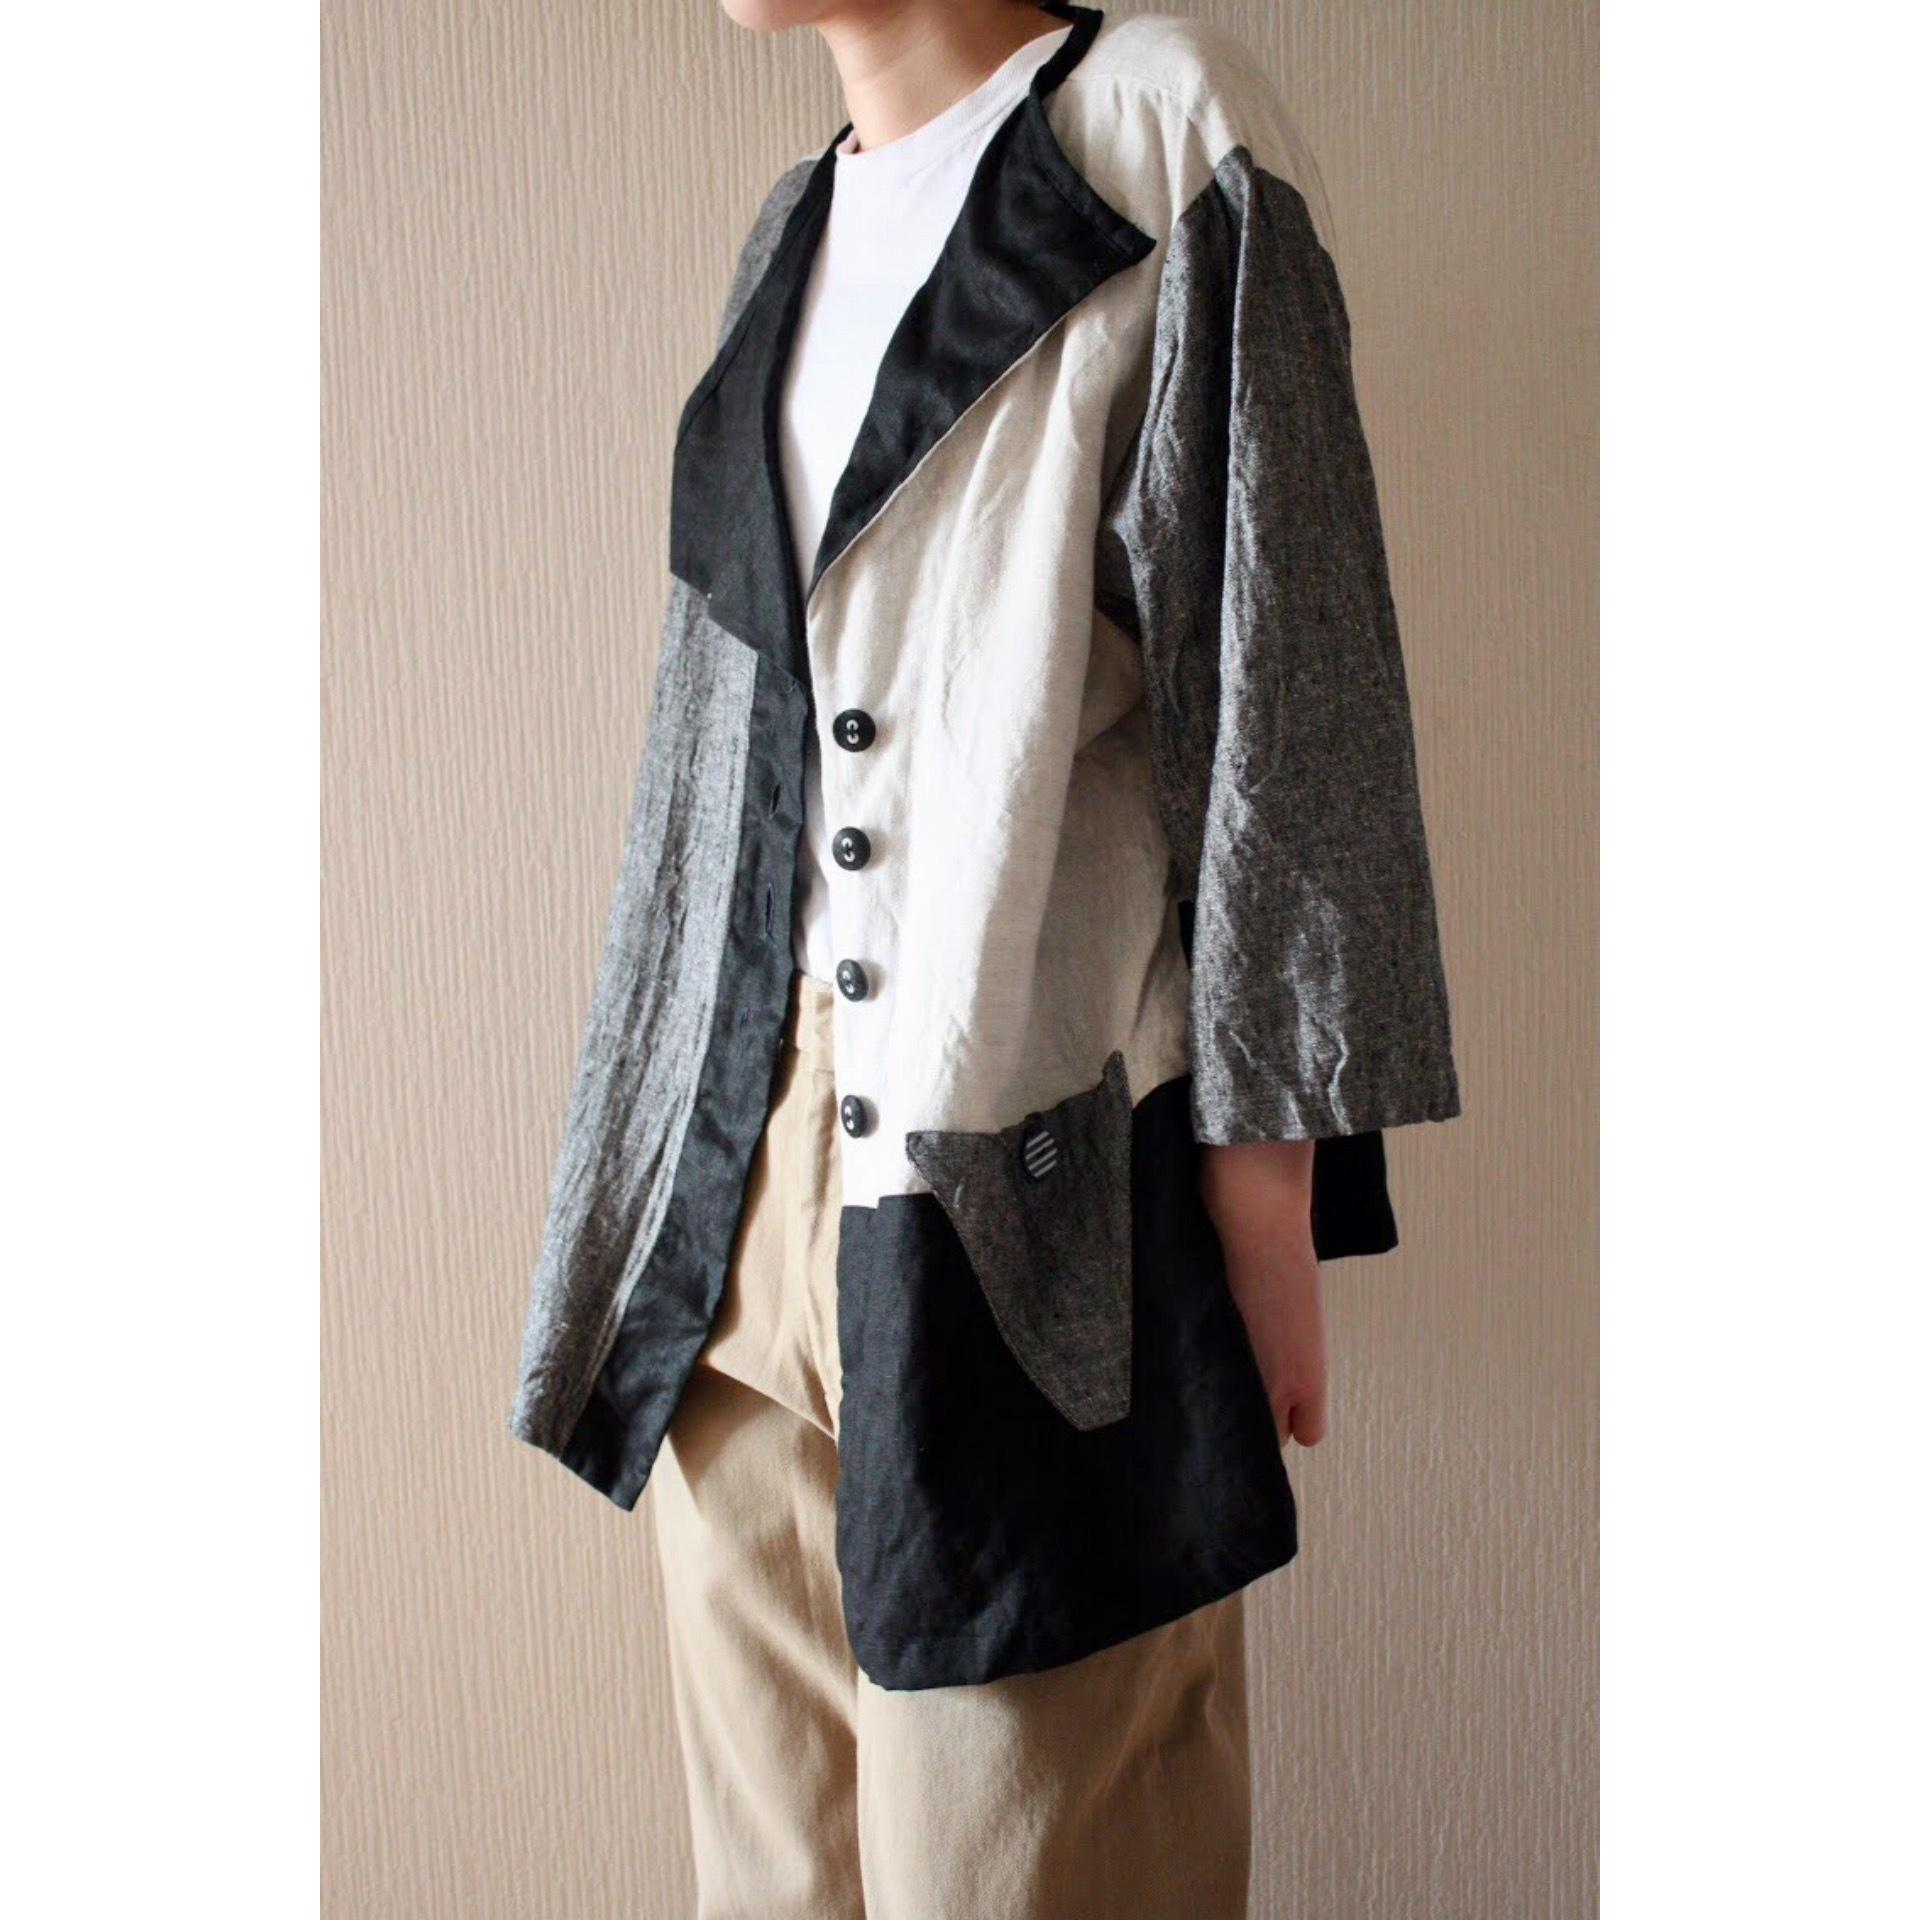 Vintage crazy pattern linen jacket